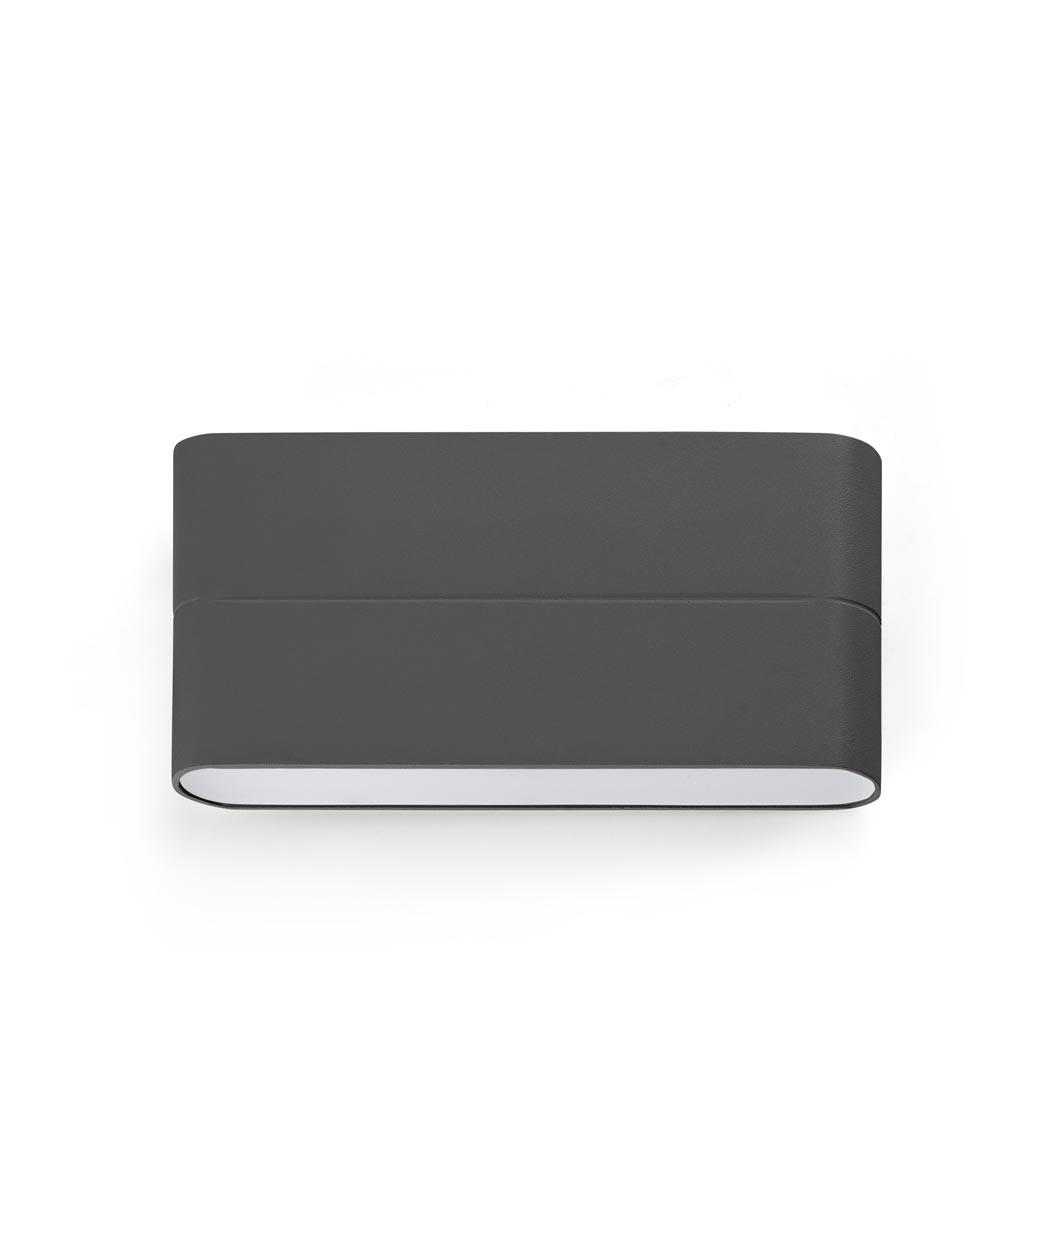 Aplique de pared LED gris ADAY